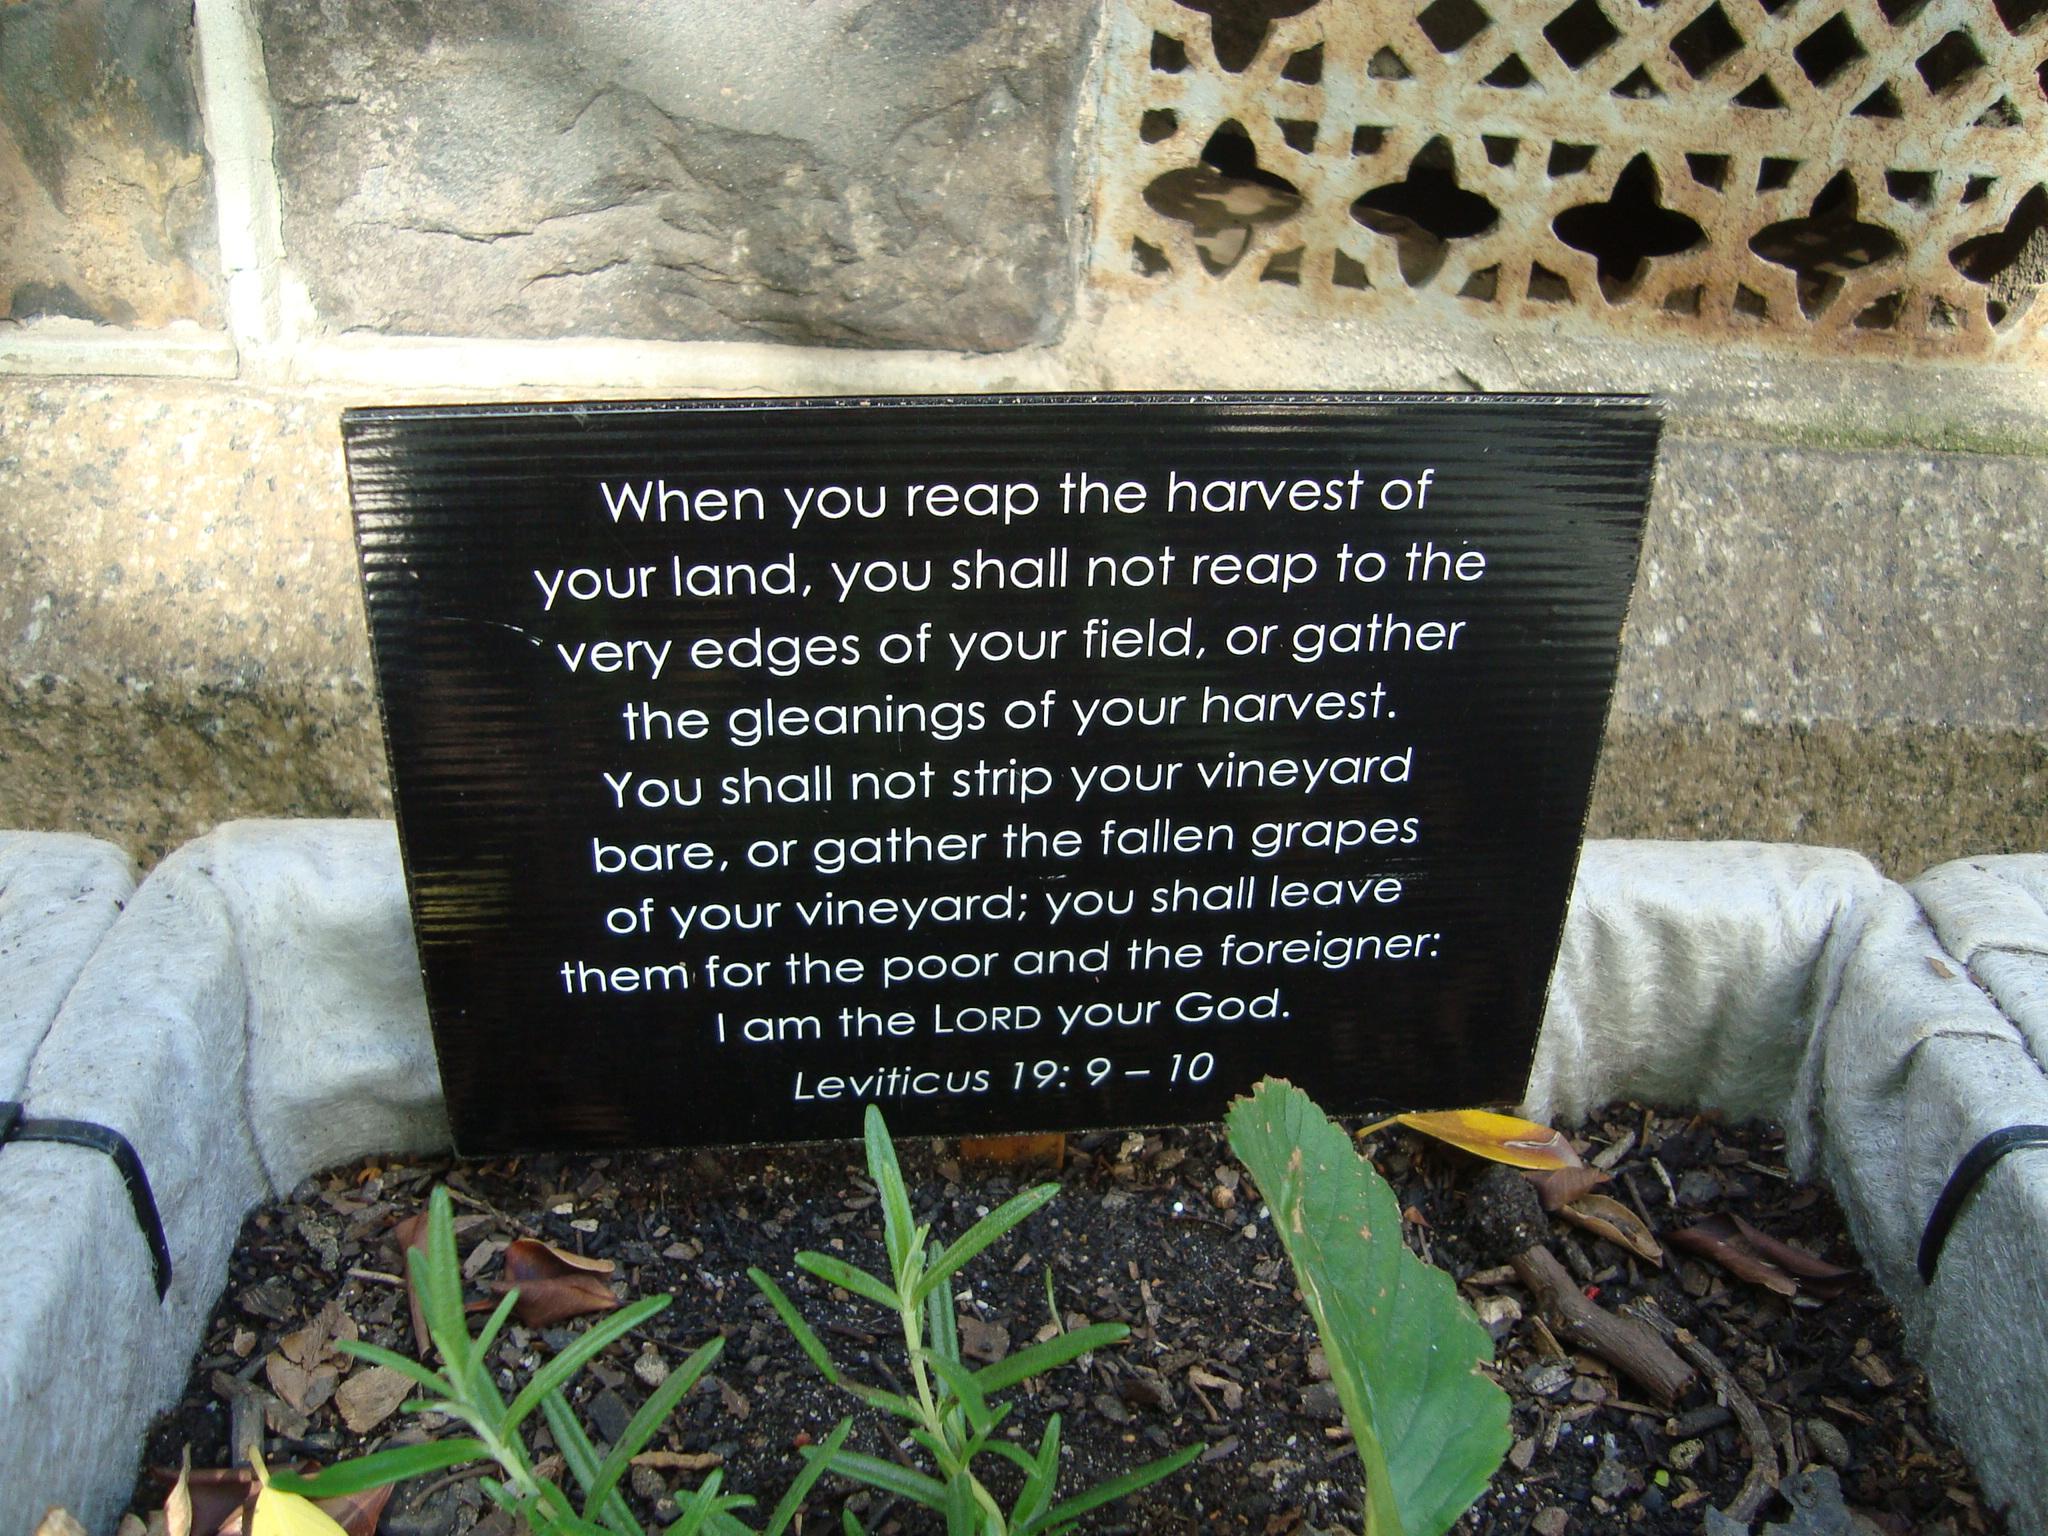 Free Veggie Garden Outside this Church